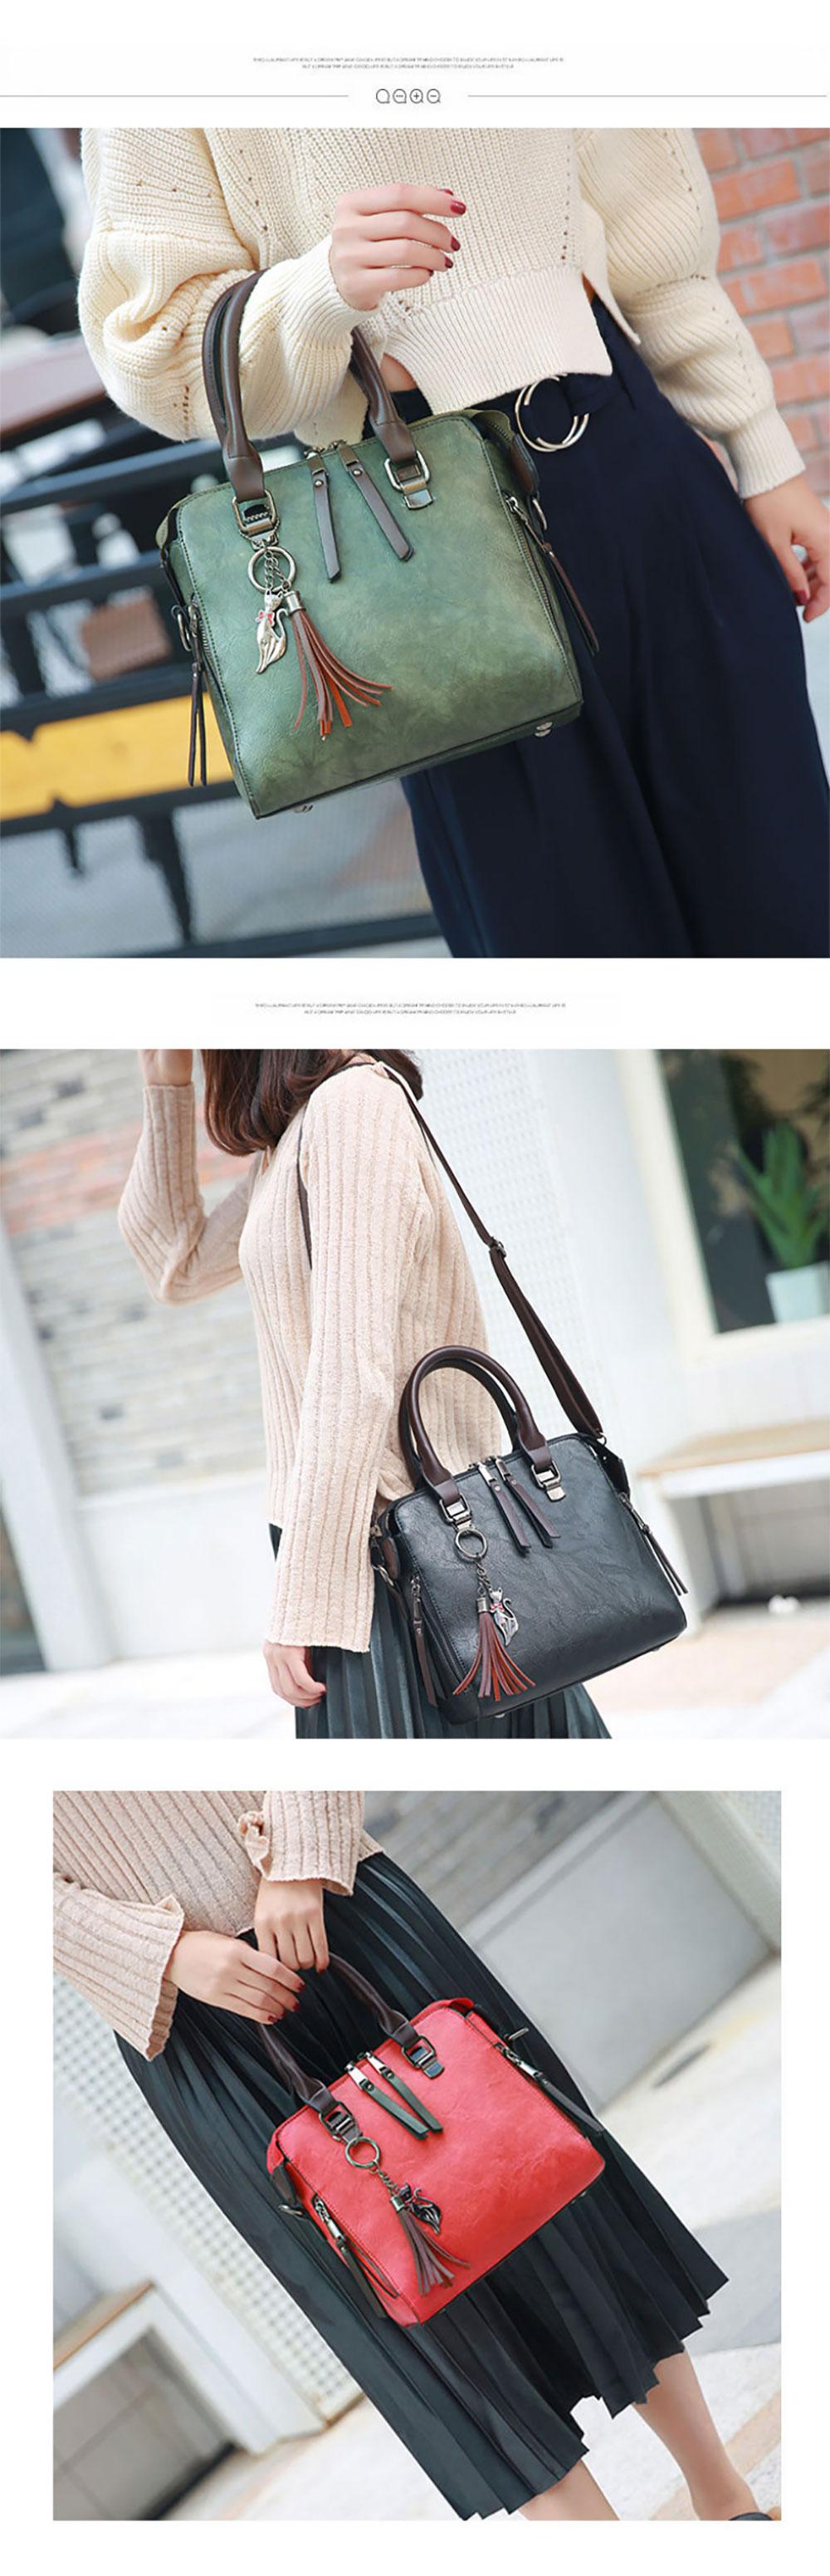 Vintage grande bolsa para mulheres neverfull sacos